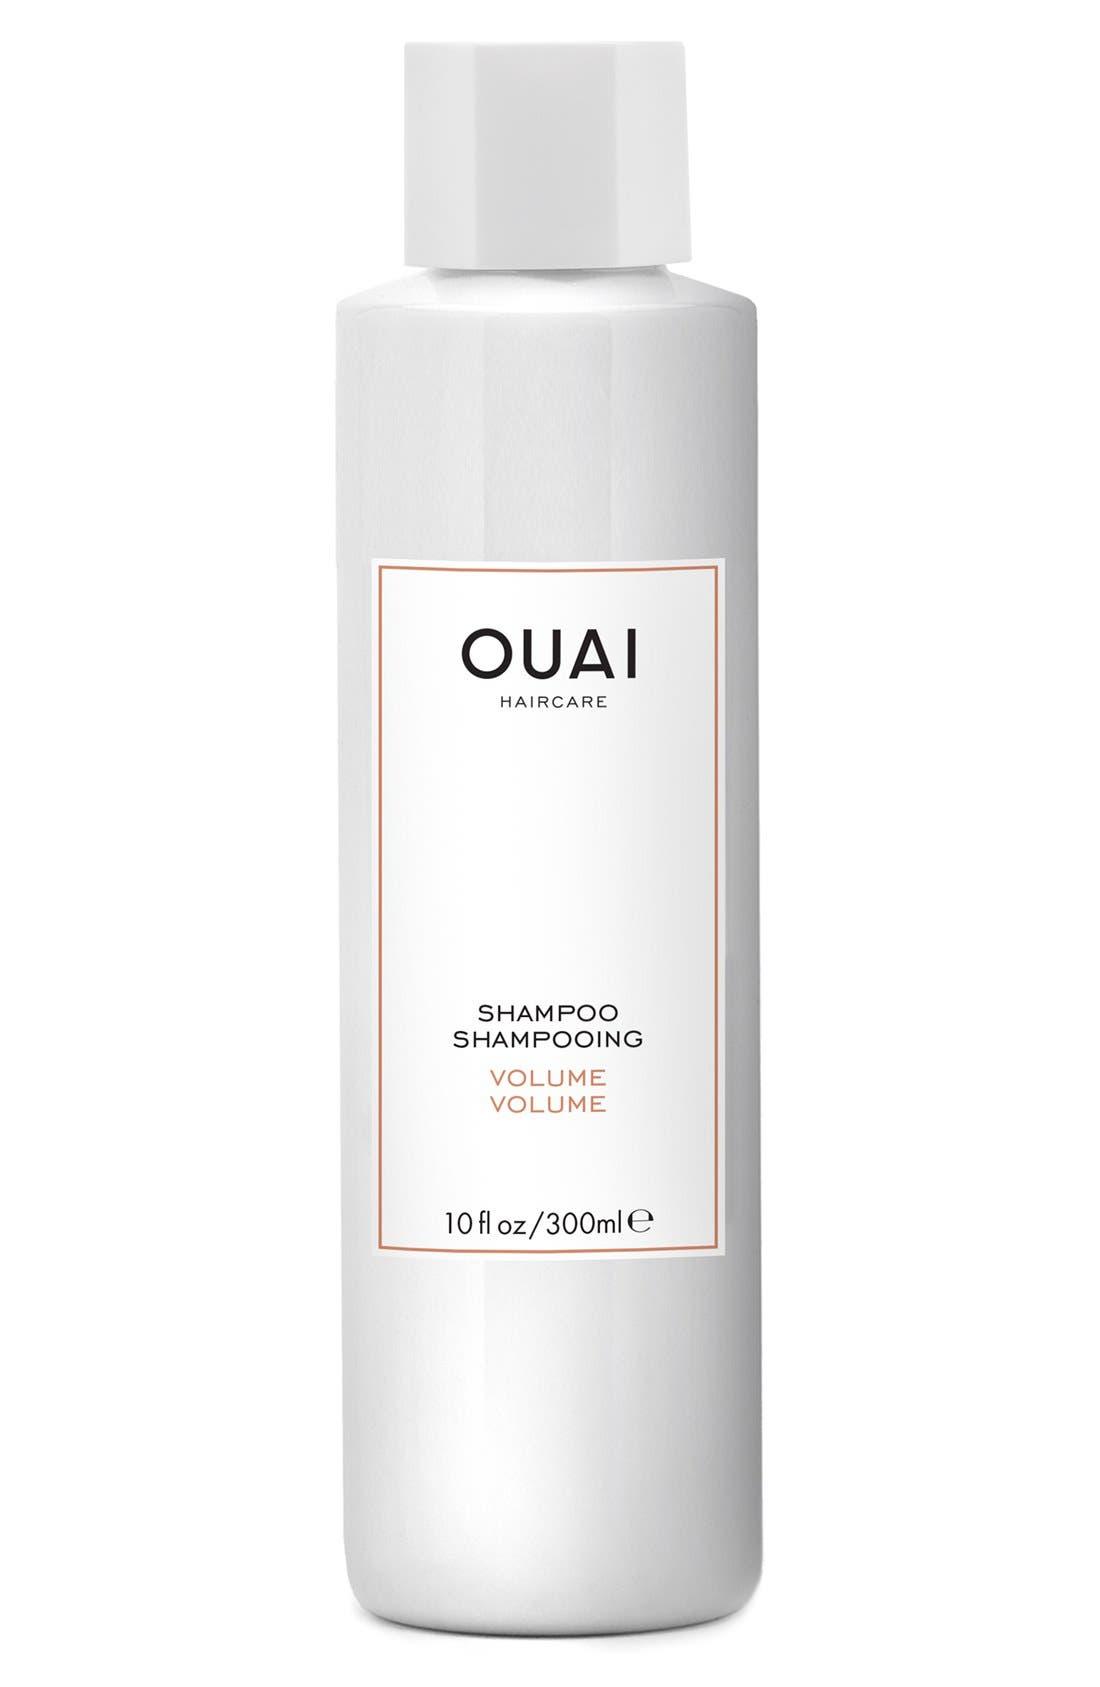 OUAI Volume Shampoo